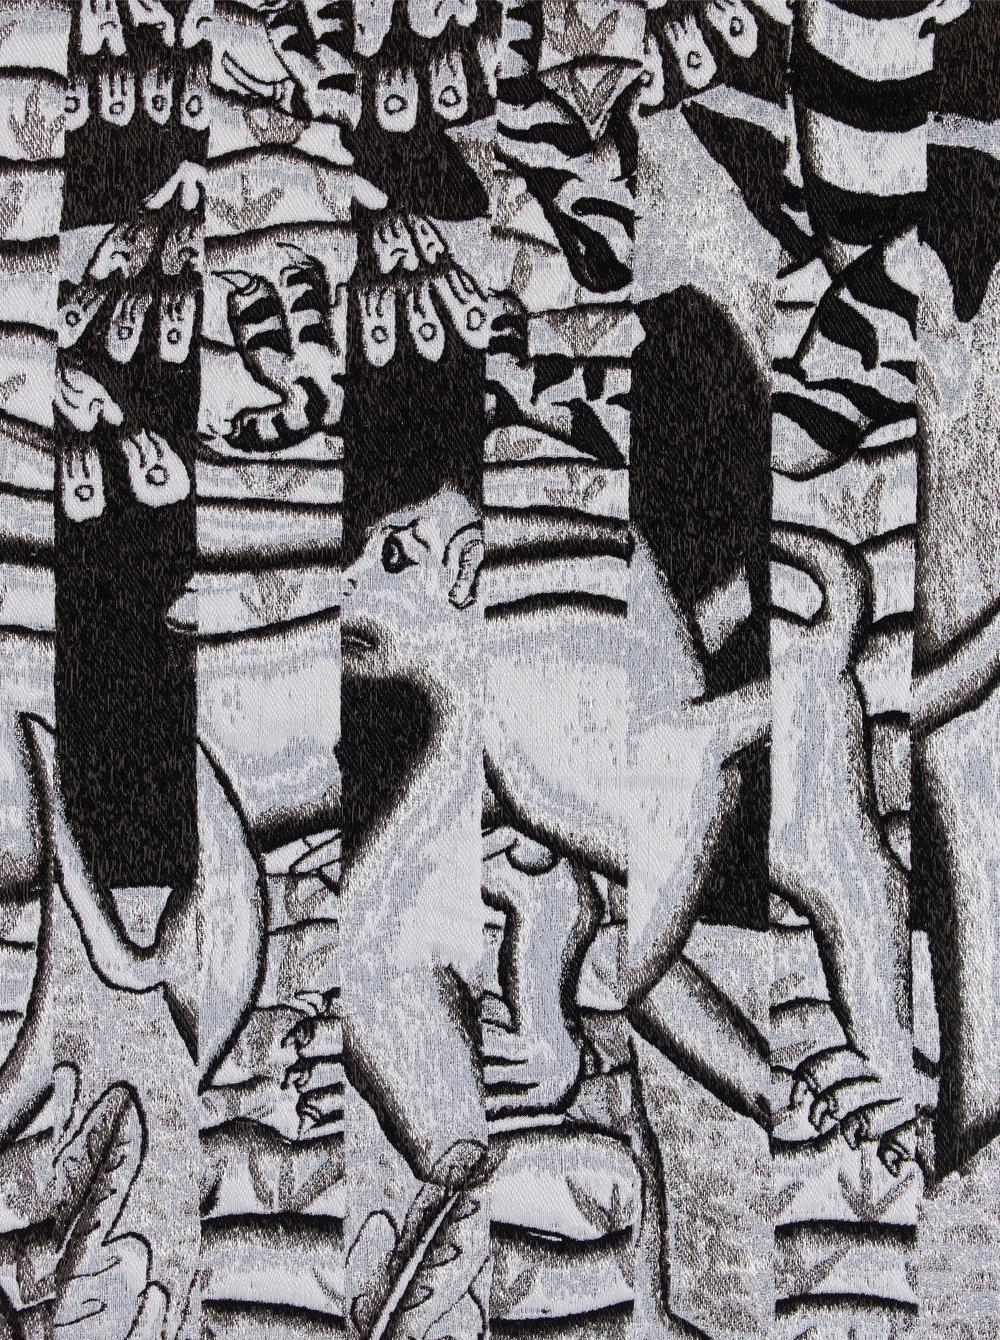 Sanur, jacquard woven, detail